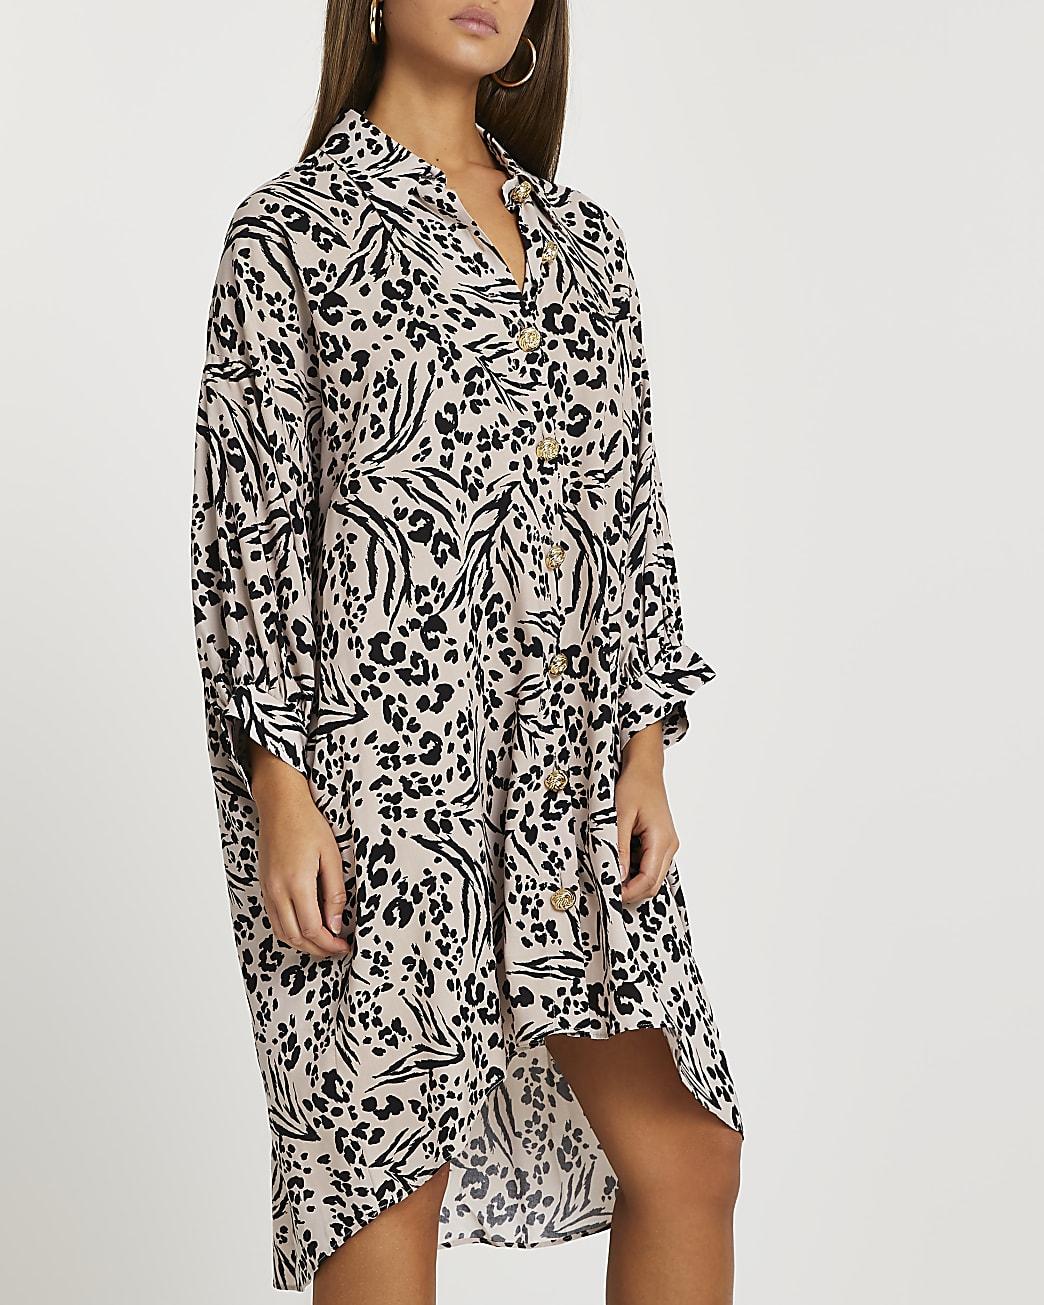 Beige animal print shirt dress